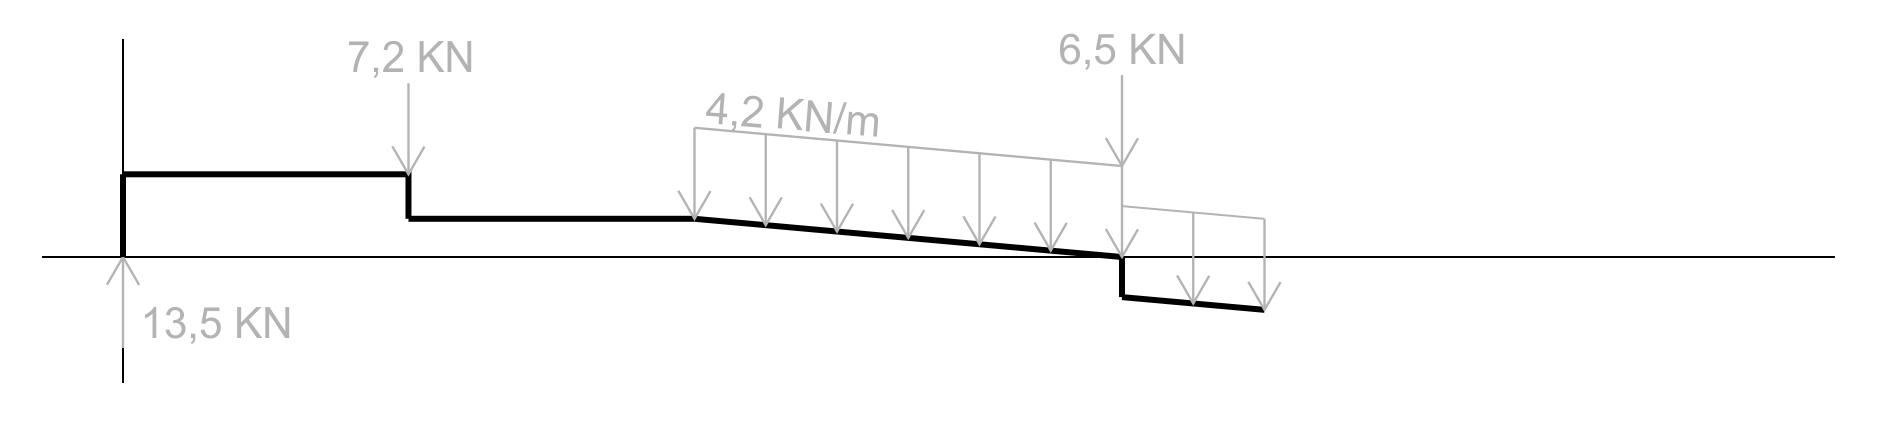 Esforço Cortante - Exemplo 2.6